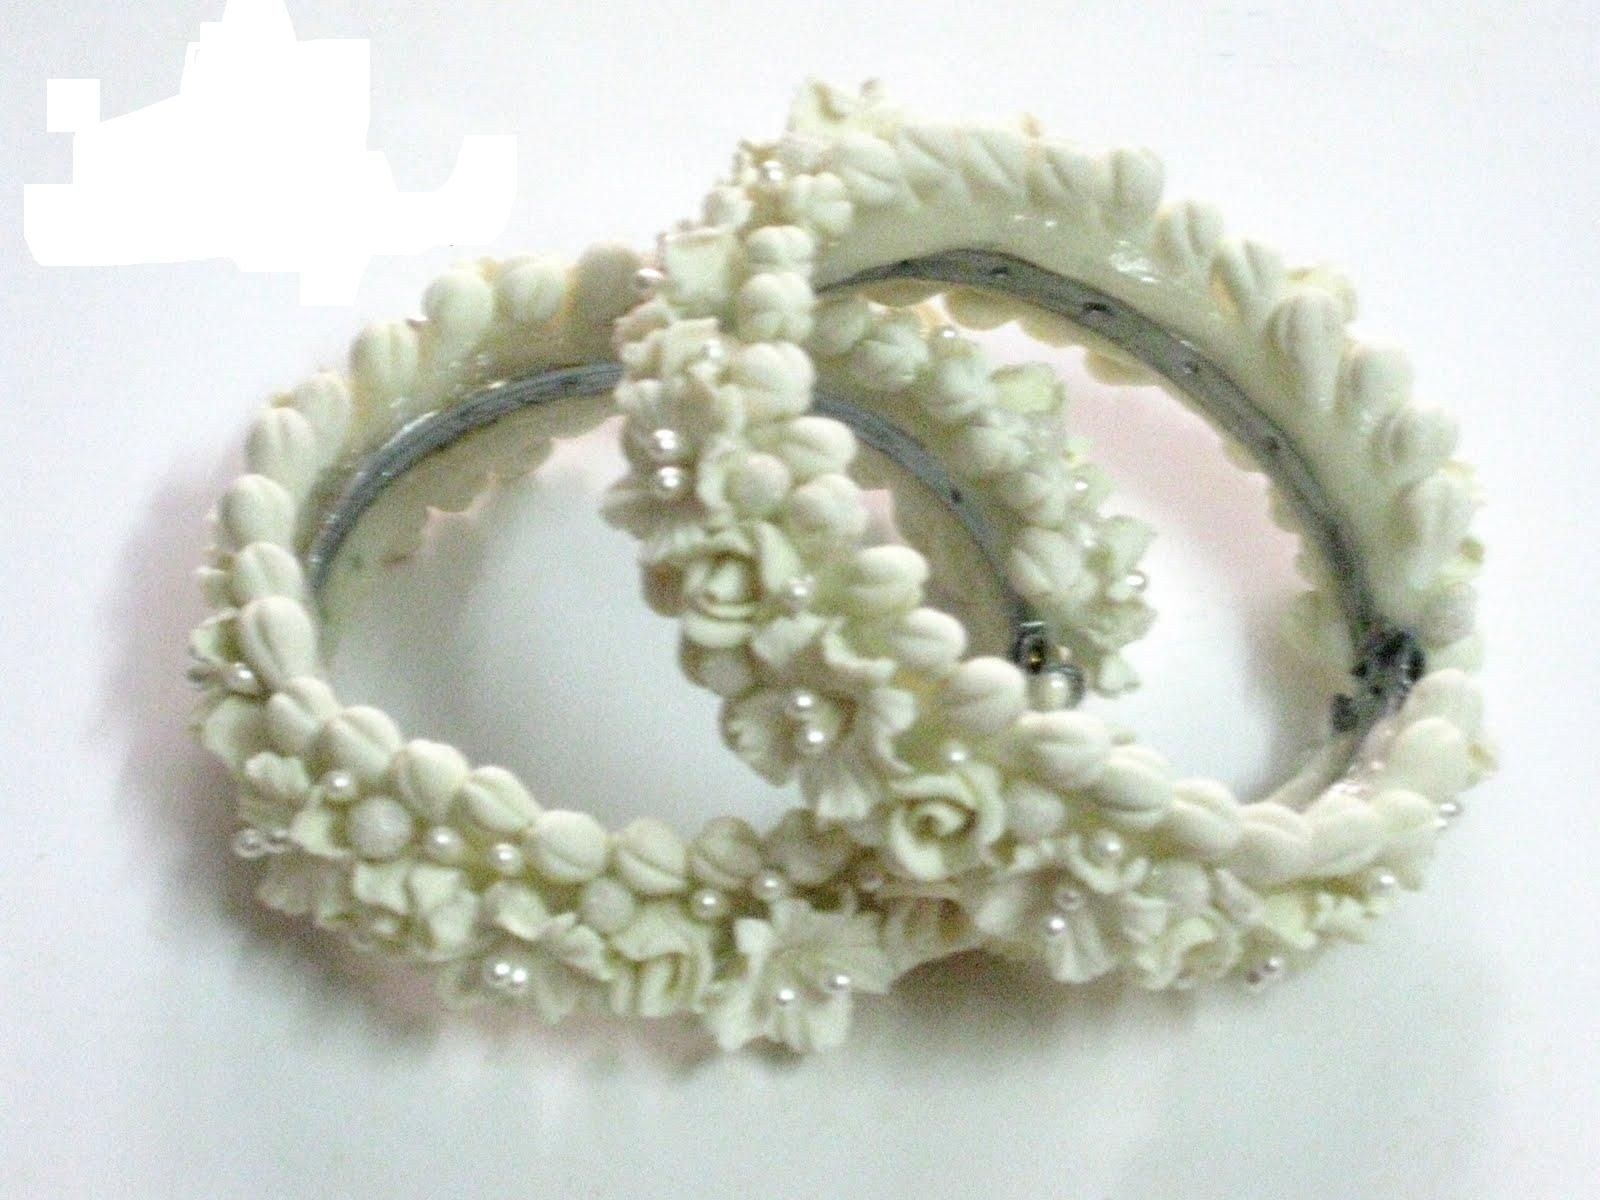 Jasmine Flower Bracelet In Pakistan Mostly Worn By Newly Wed Brides